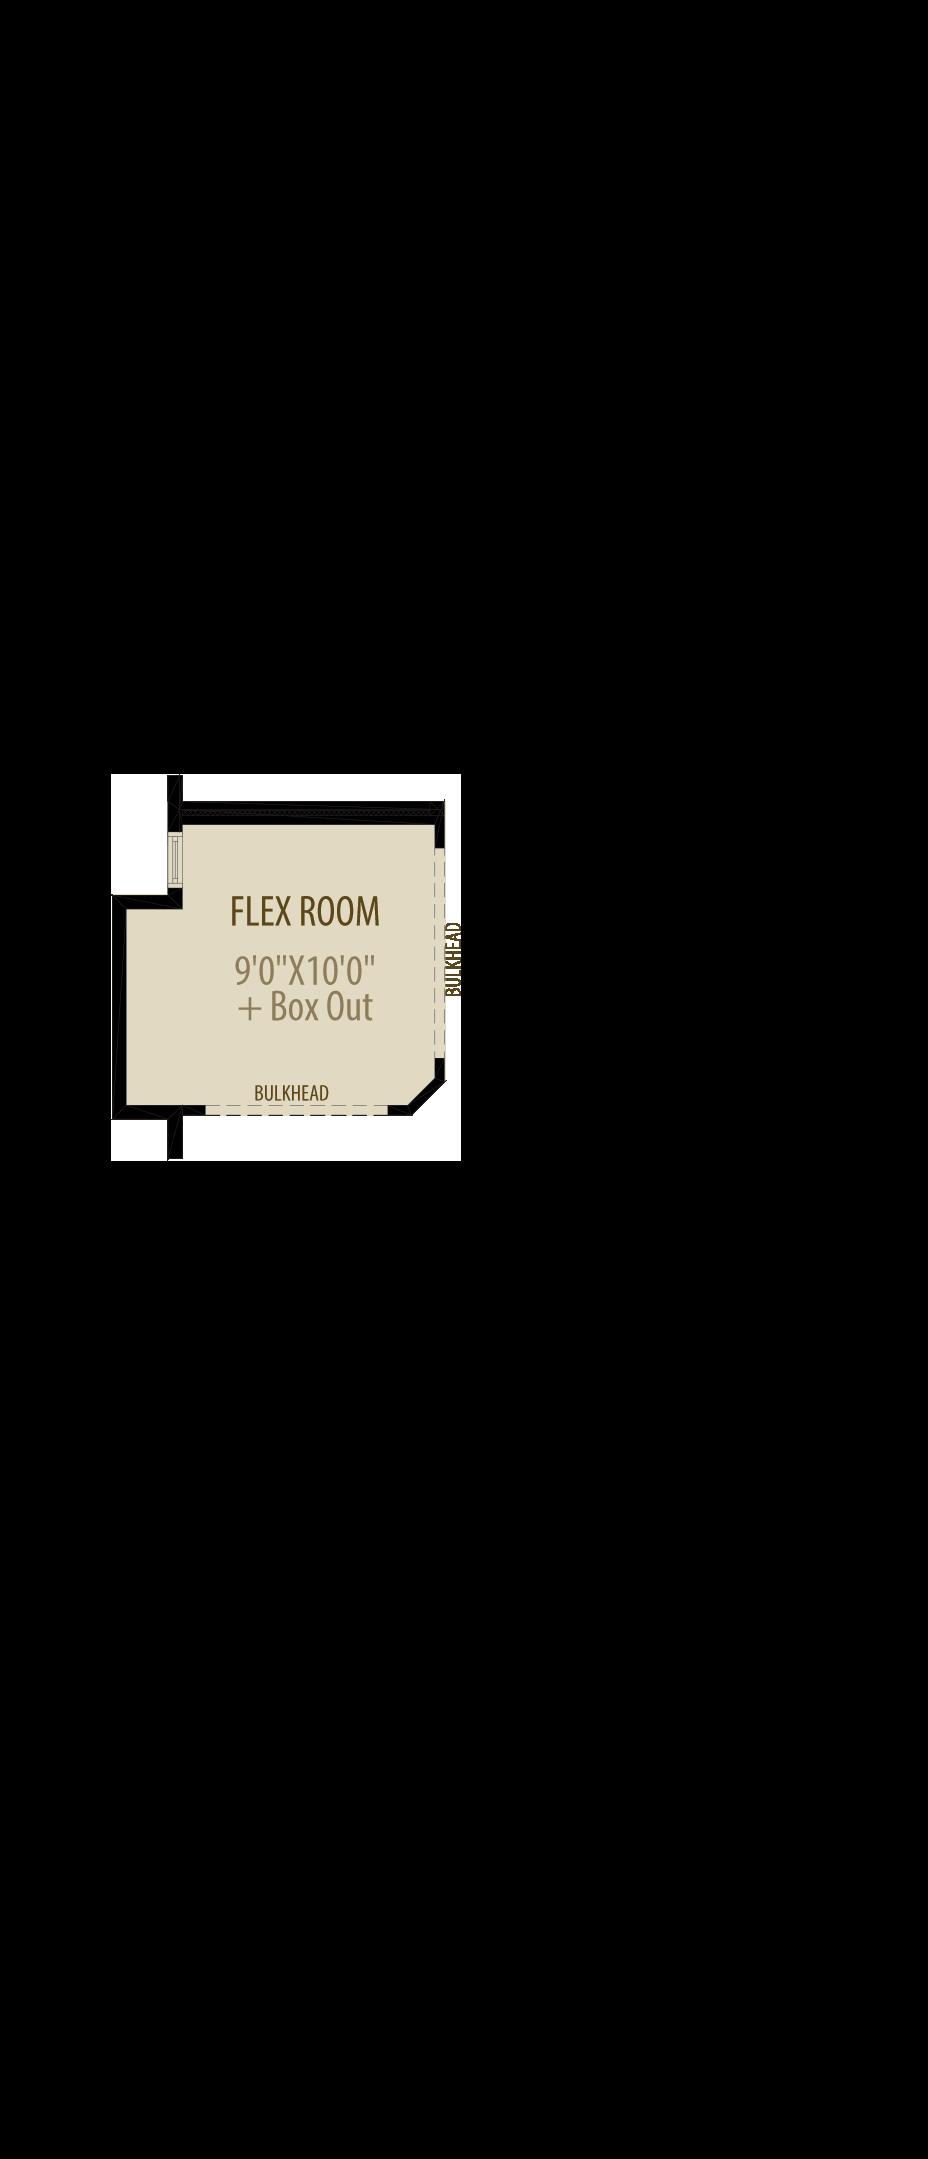 Flex Room Cantilever Adds 16Sq Ft